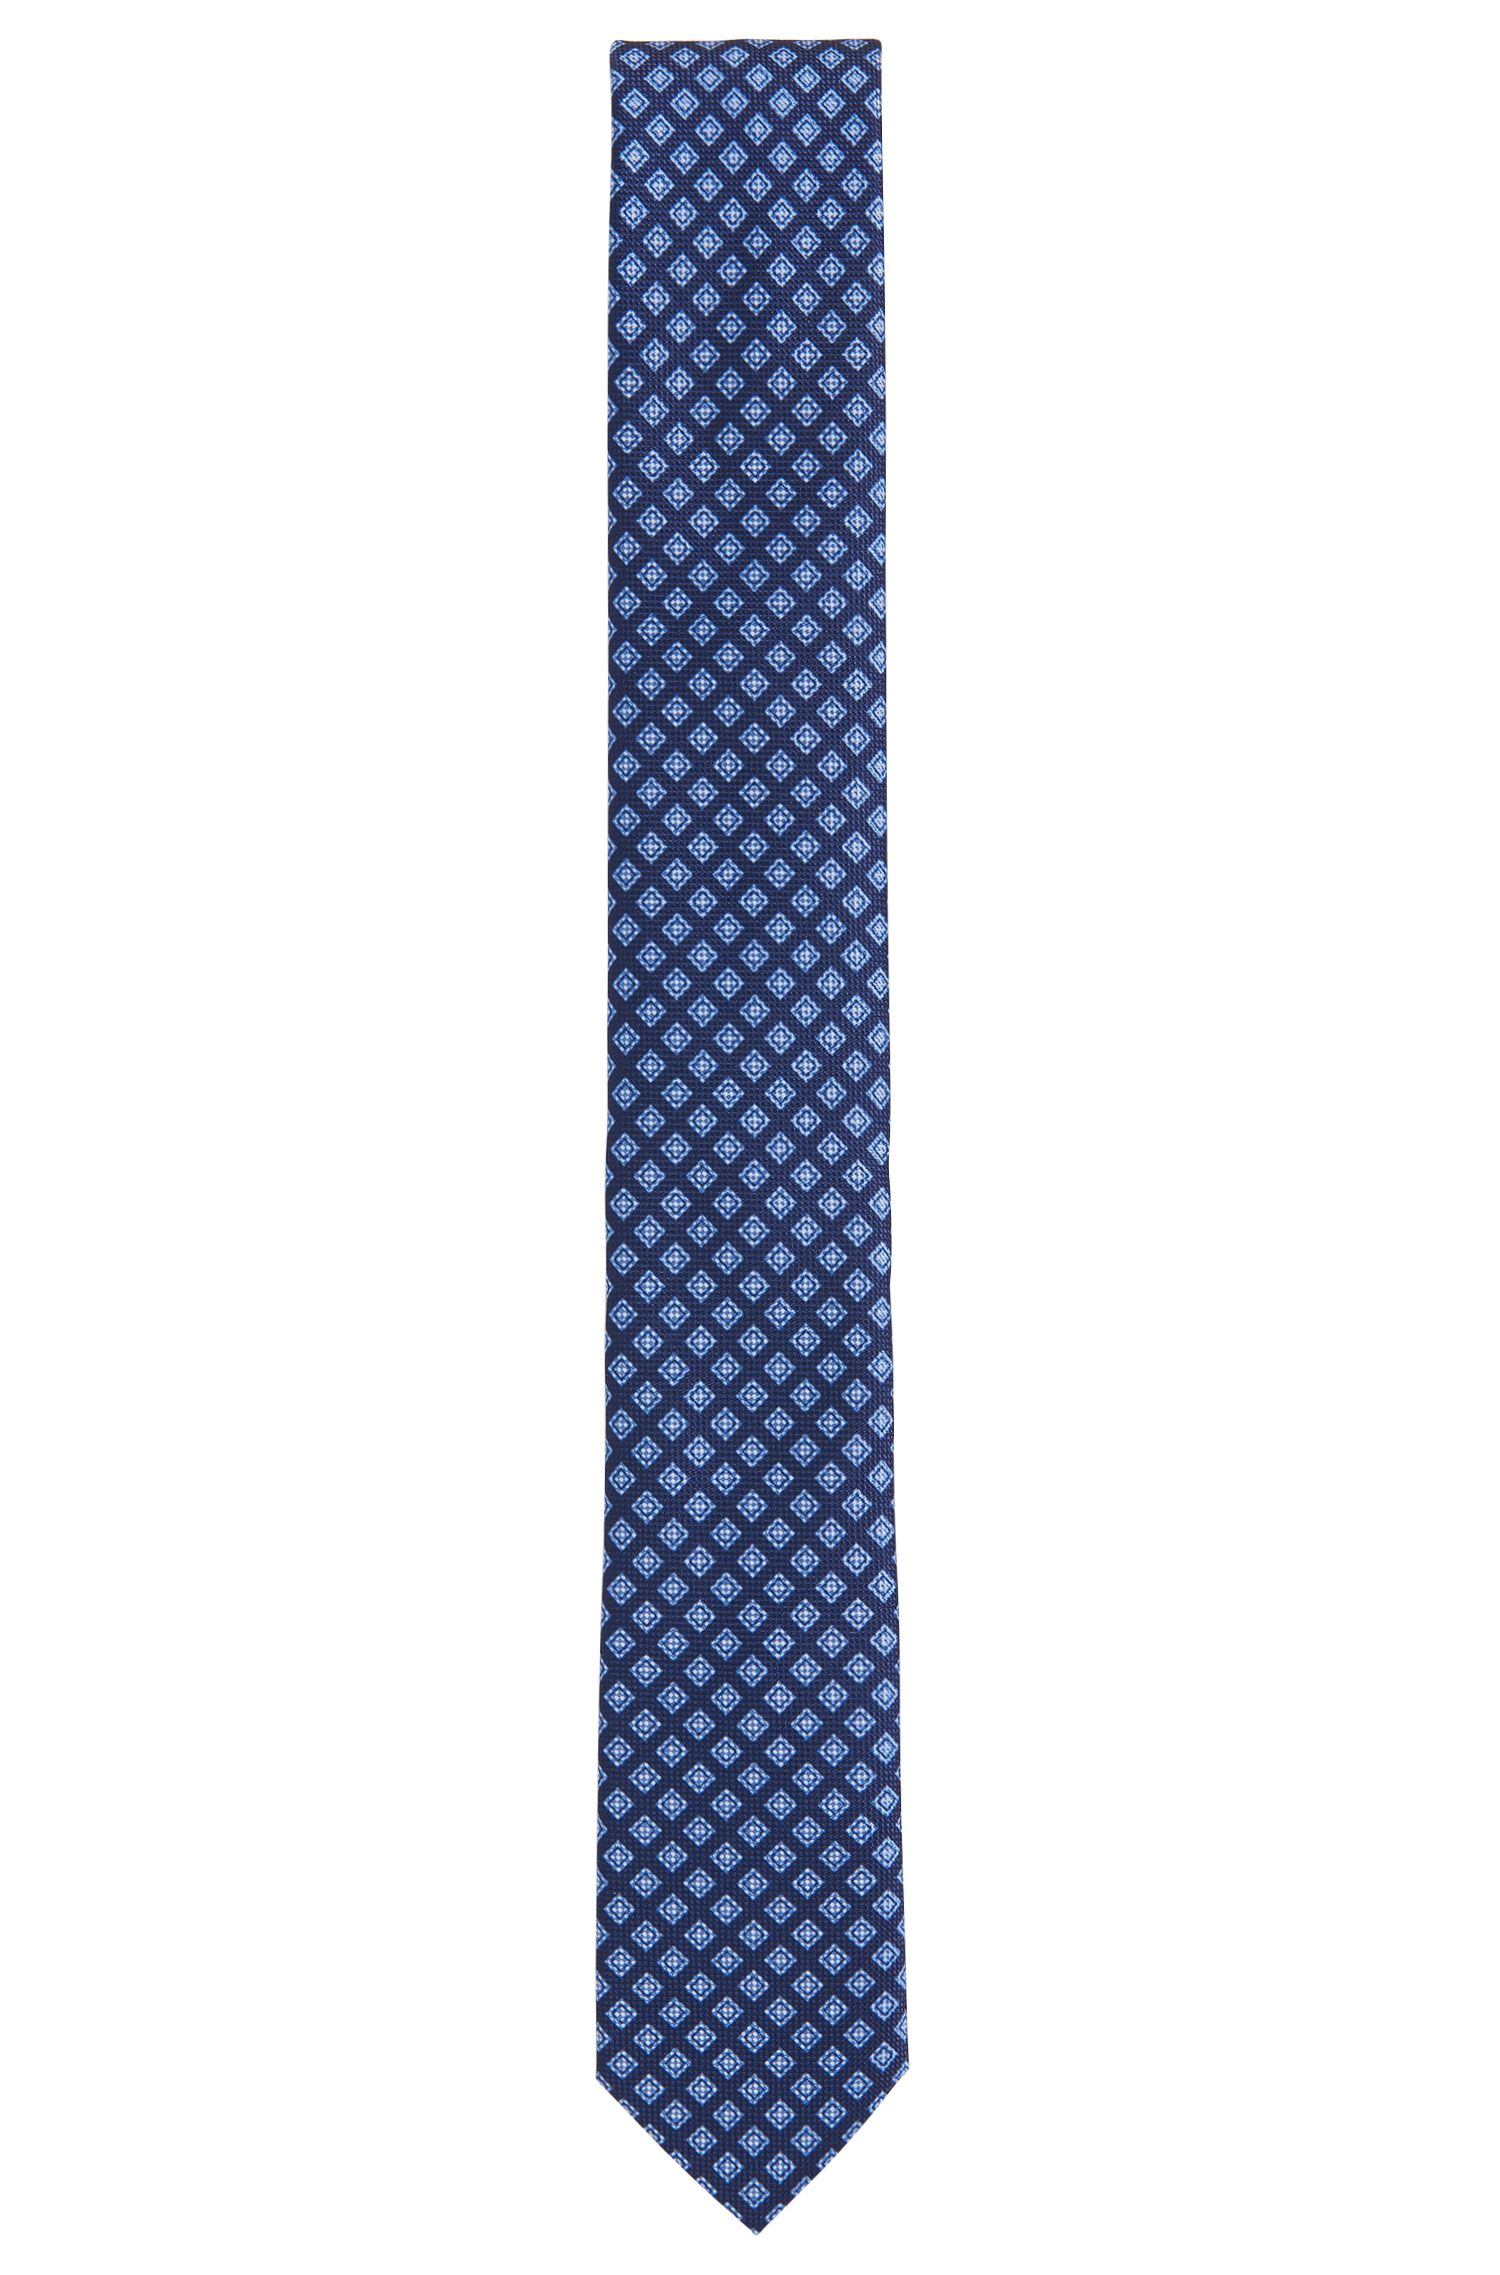 'Tie 6 cm' | Slim, Italian Silk Tie